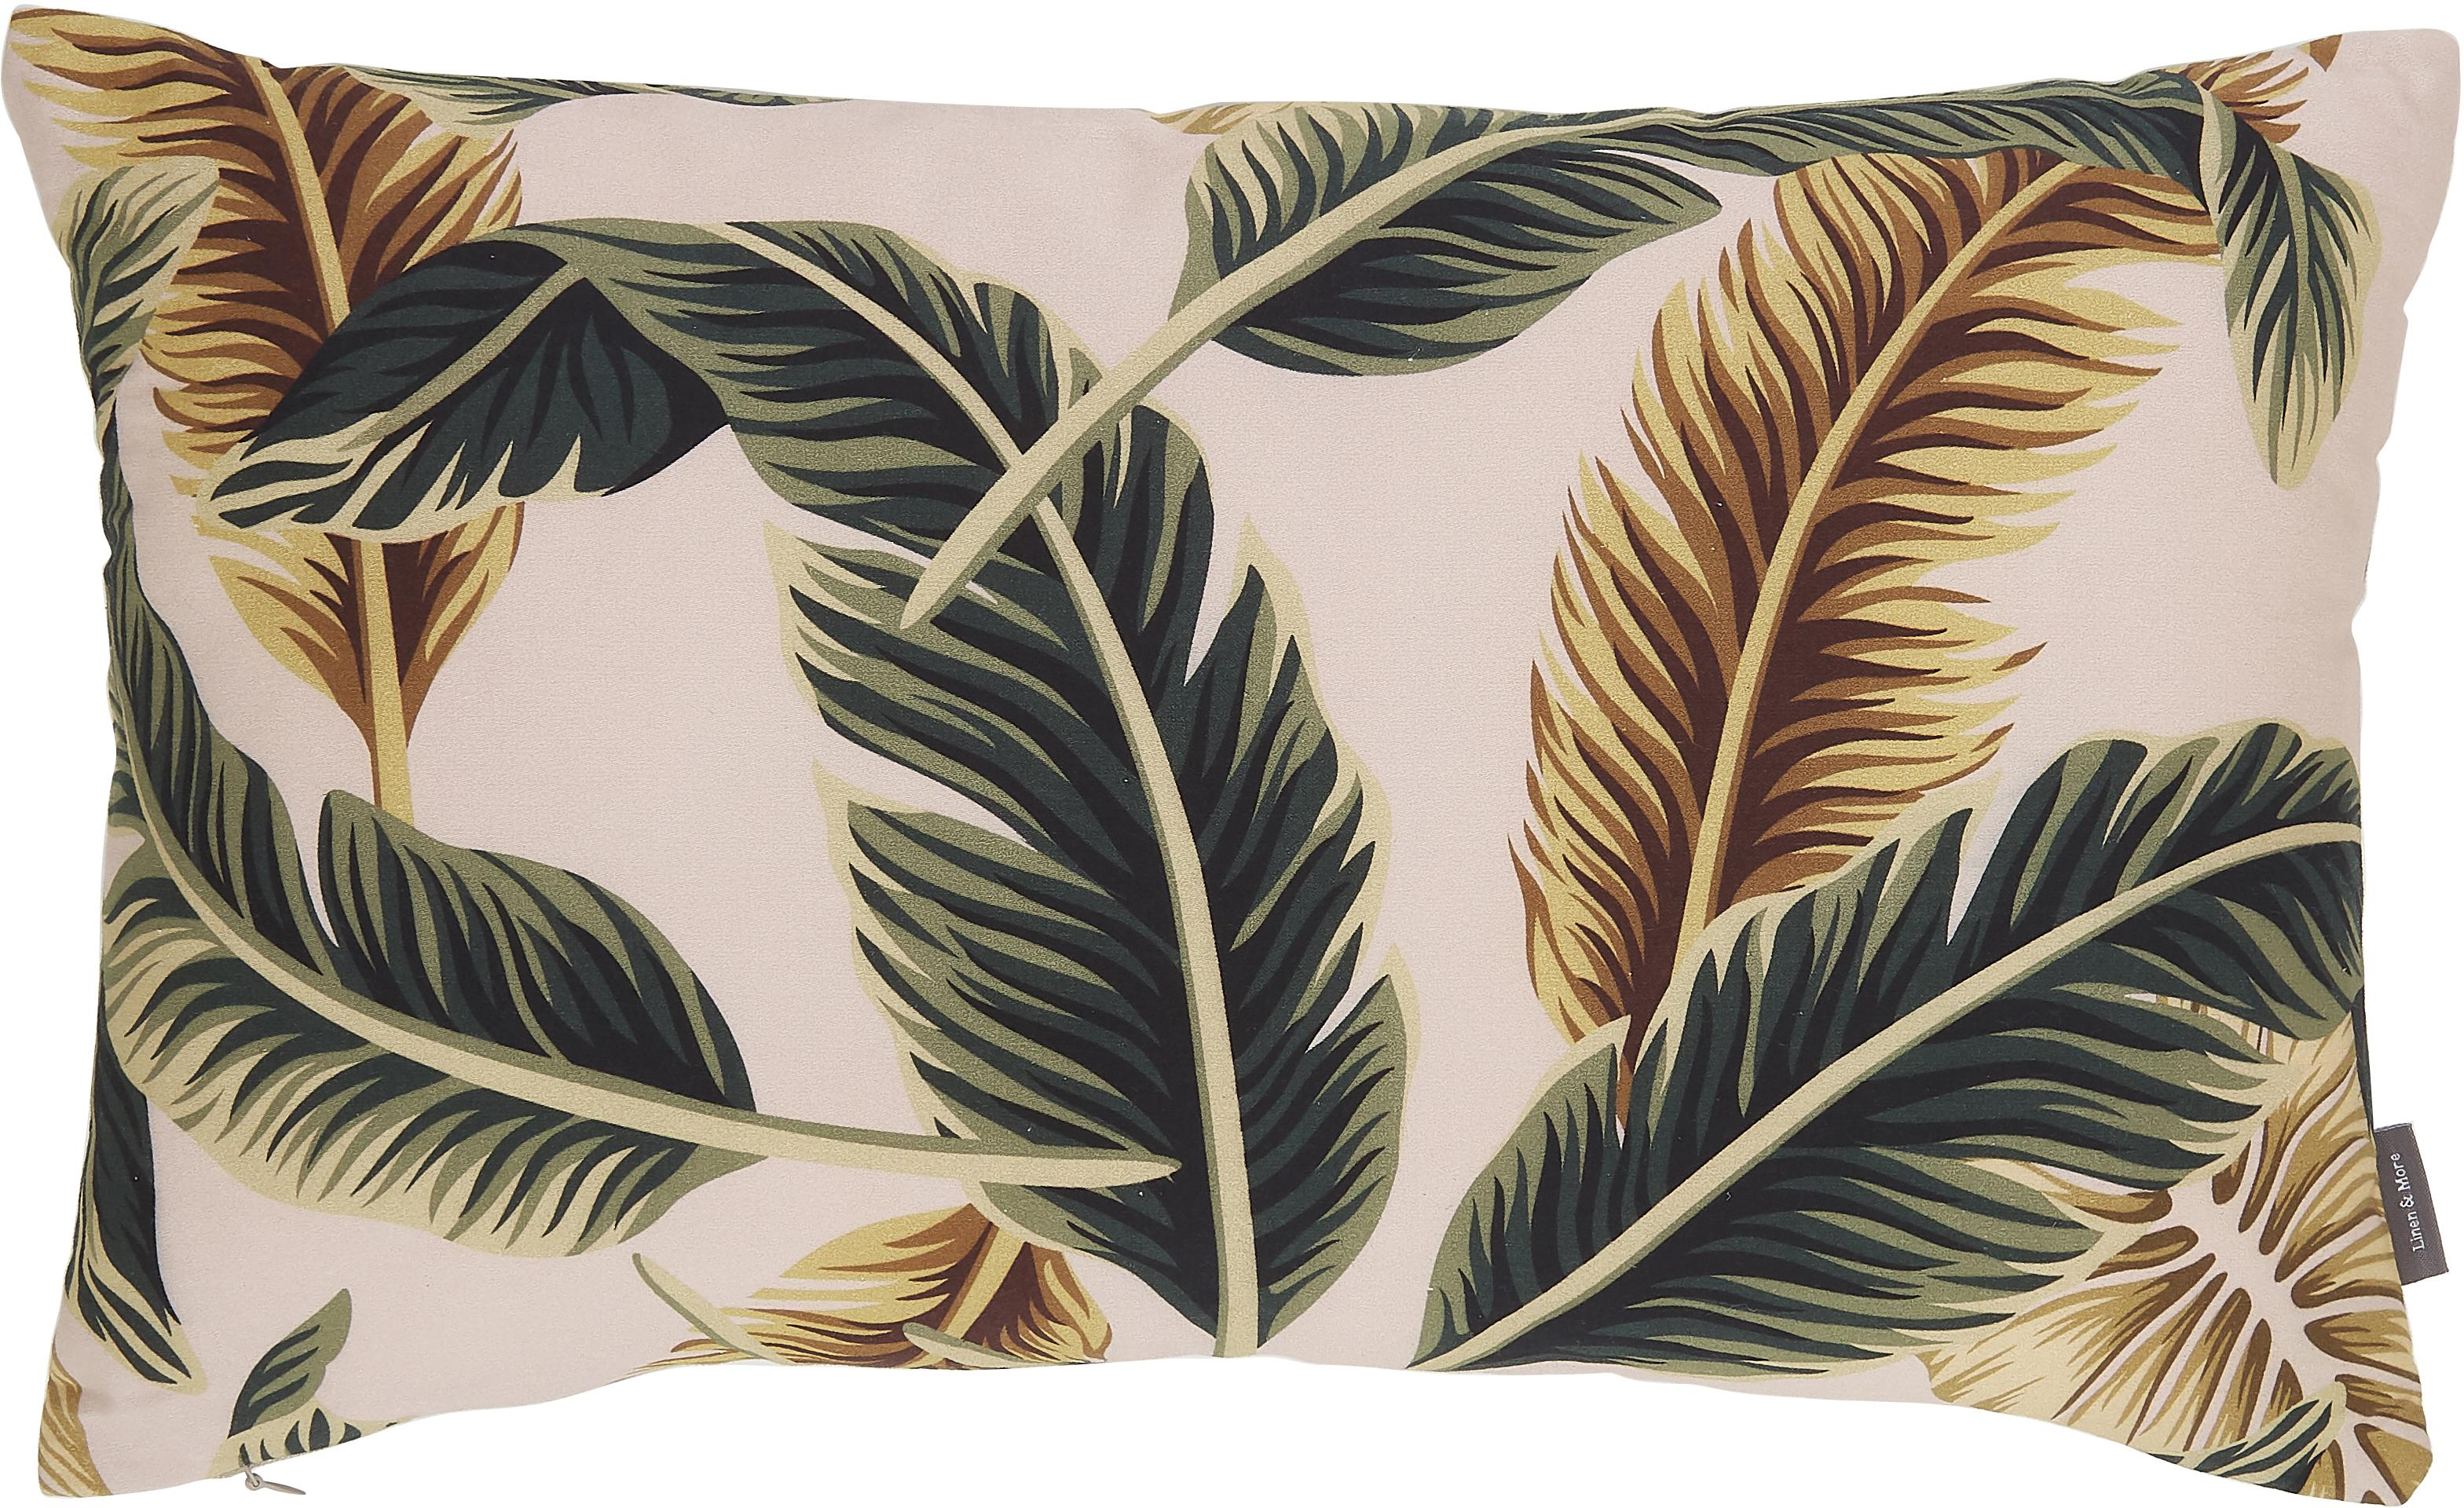 Cuscino con imbottitura Elegant Feather, 100% cotone, Beige, verde, giallo dorato, Larg. 30 x Lung. 50 cm